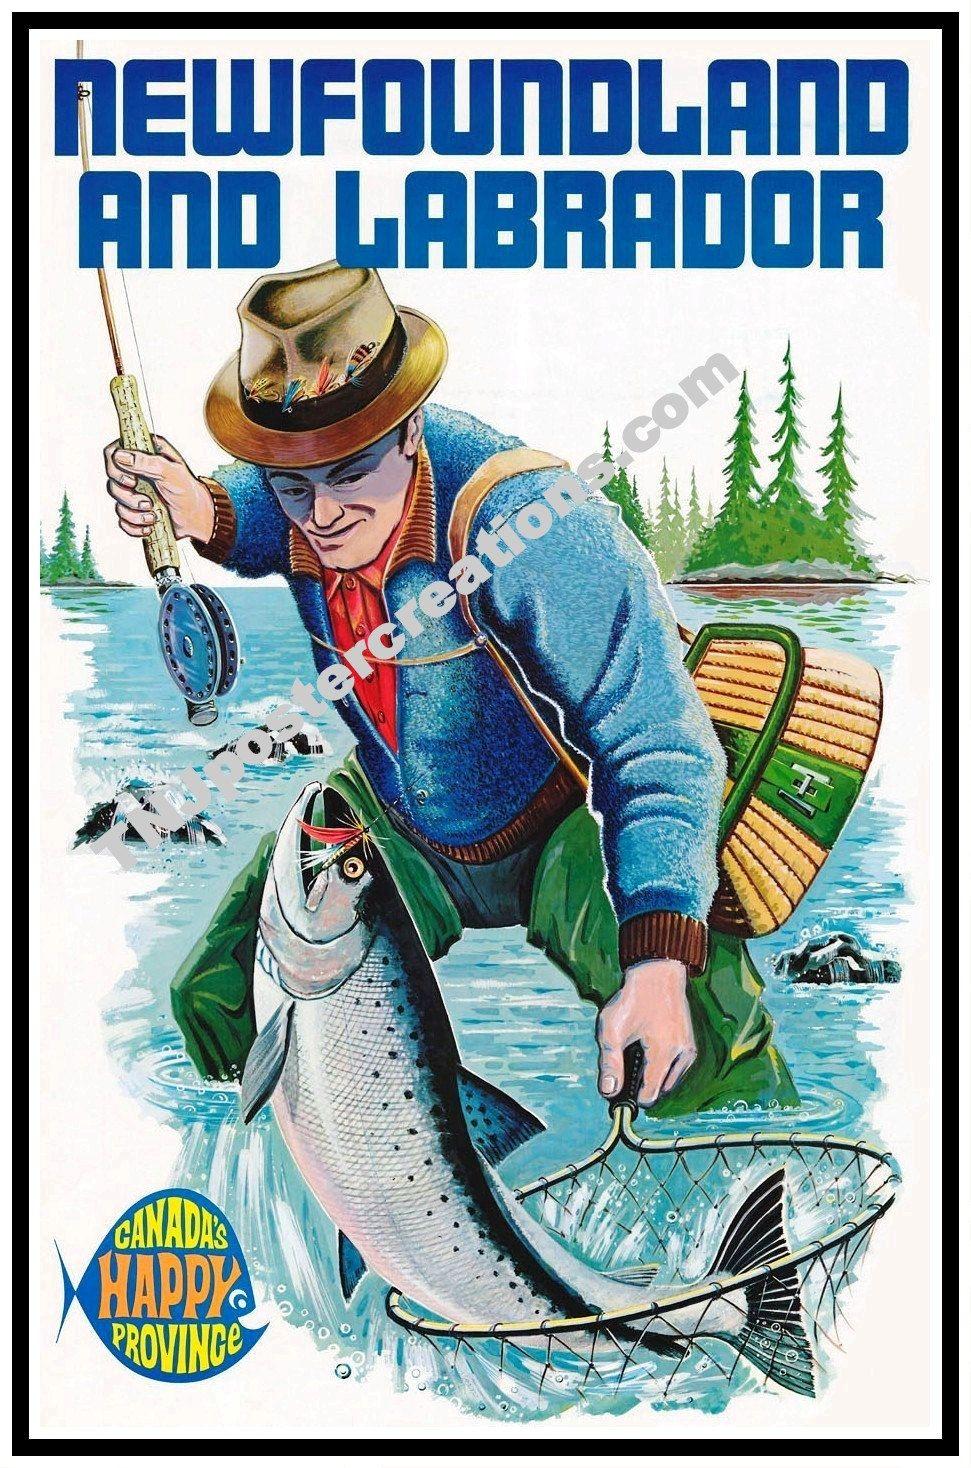 Newfoundland and labrador promotional poster canadas happy province newfoundland and labrador promotional poster canadas happy province fishing kristyandbryce Choice Image